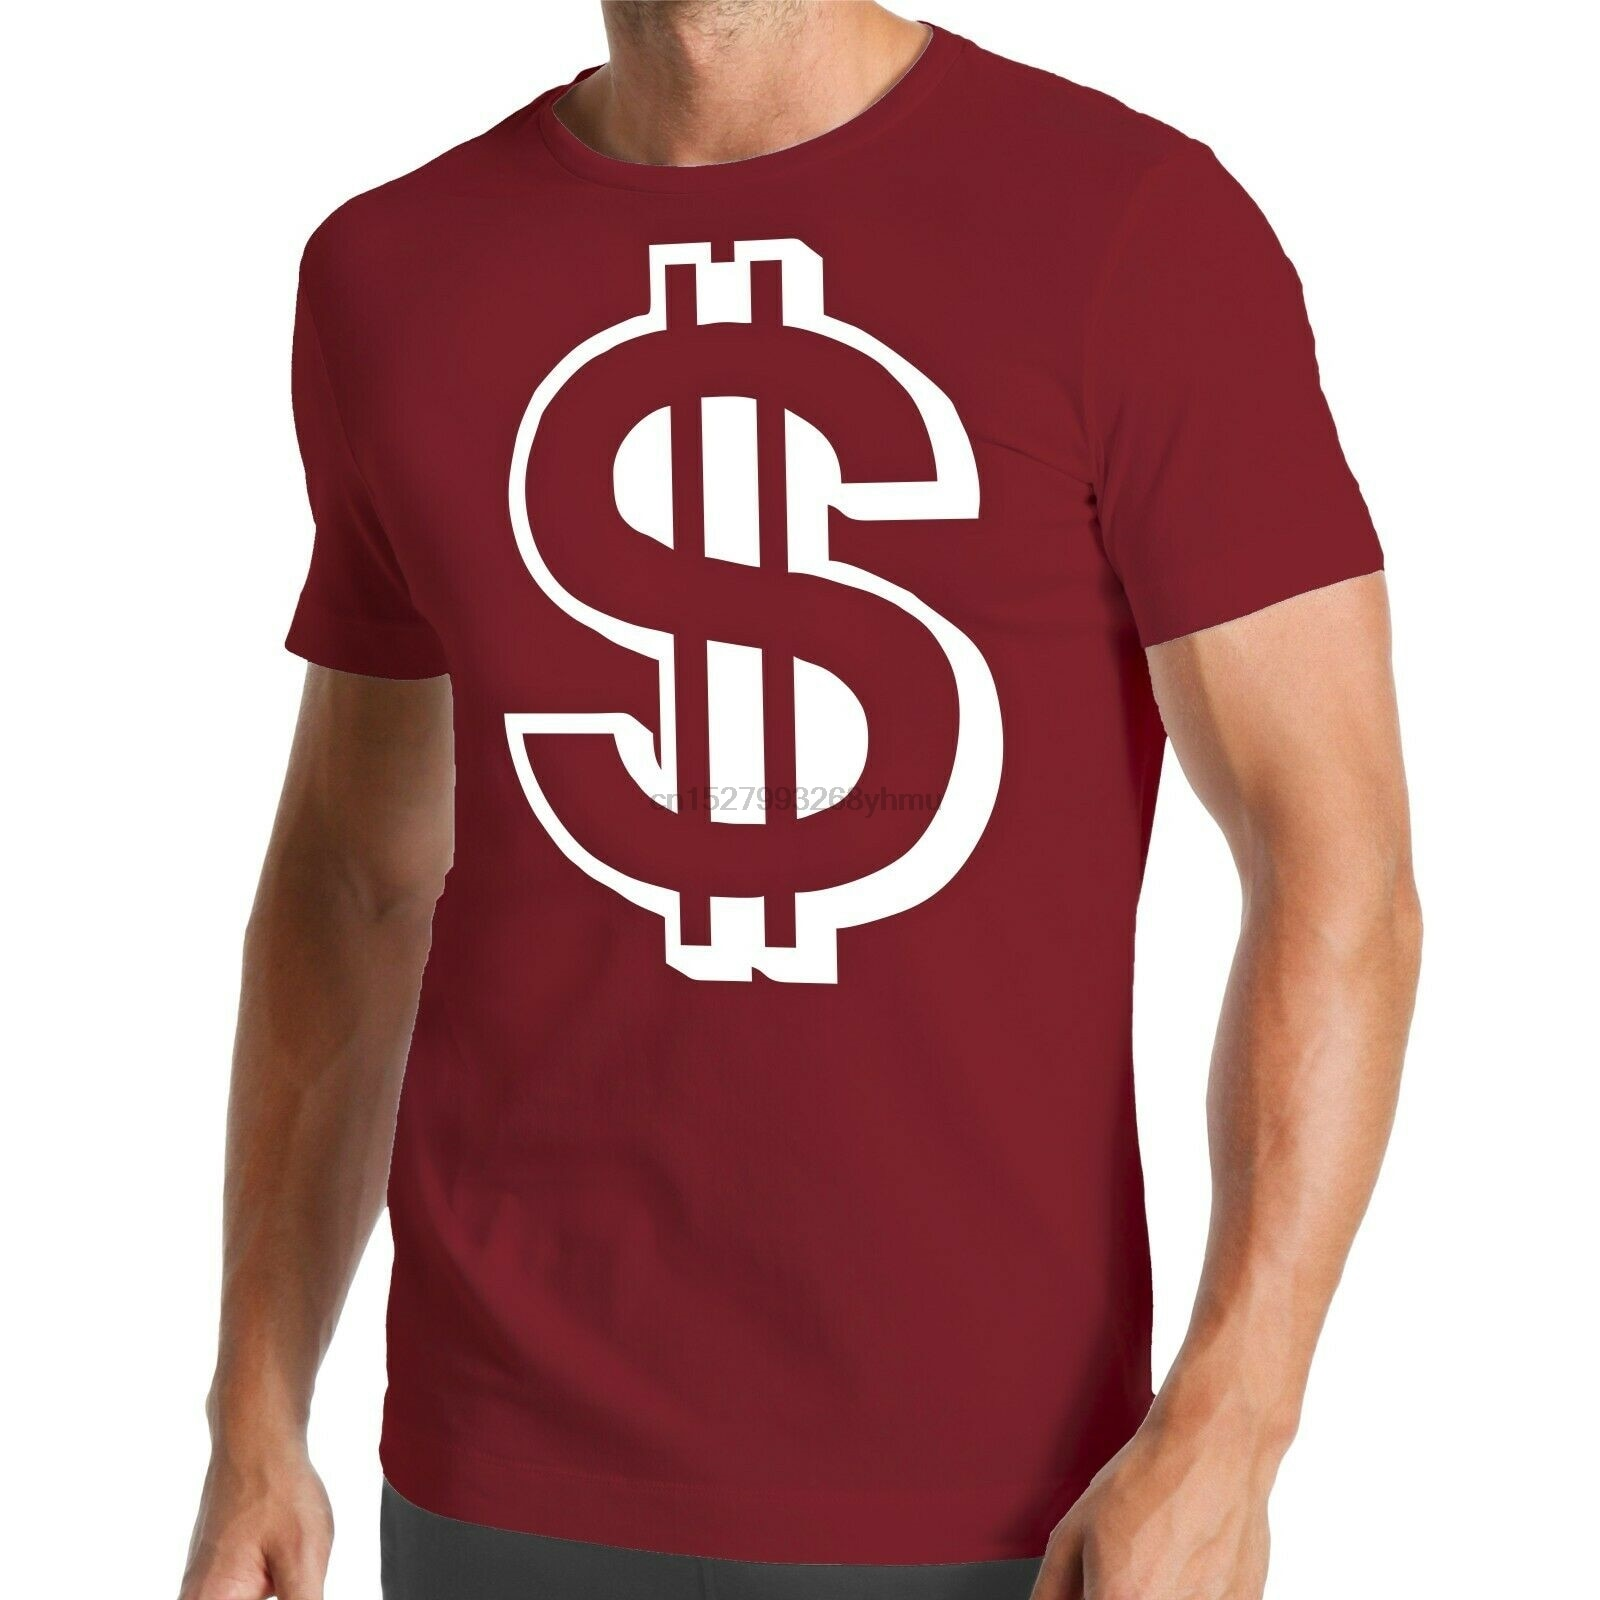 Dollar T-Shirt   US   CASH   Money   EXCHANGE   Bitcoin   Stock Exchange   Stock